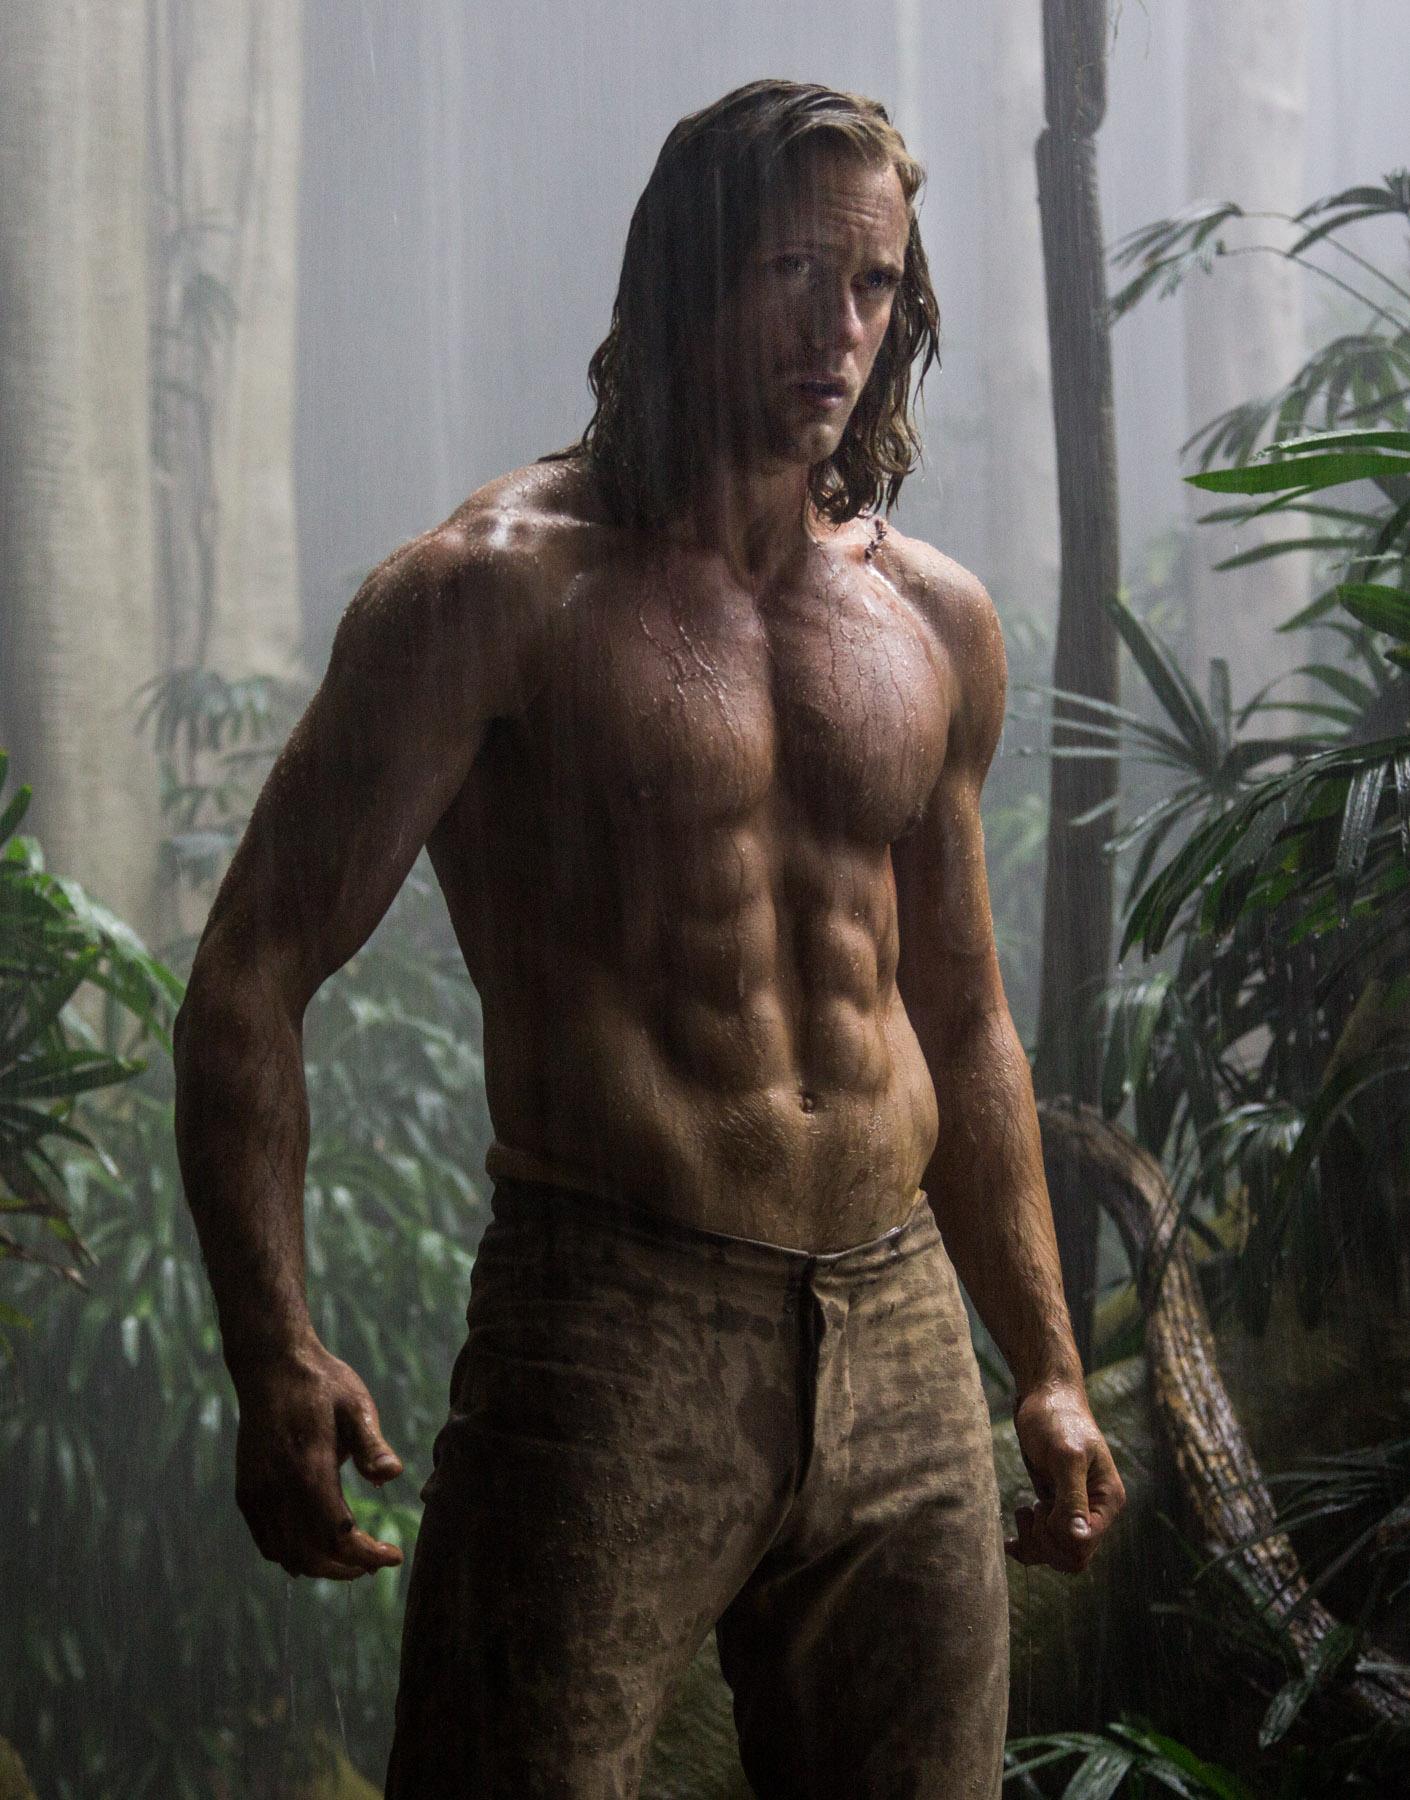 Alexander Skarsgard sizzles in new Tarzan pics